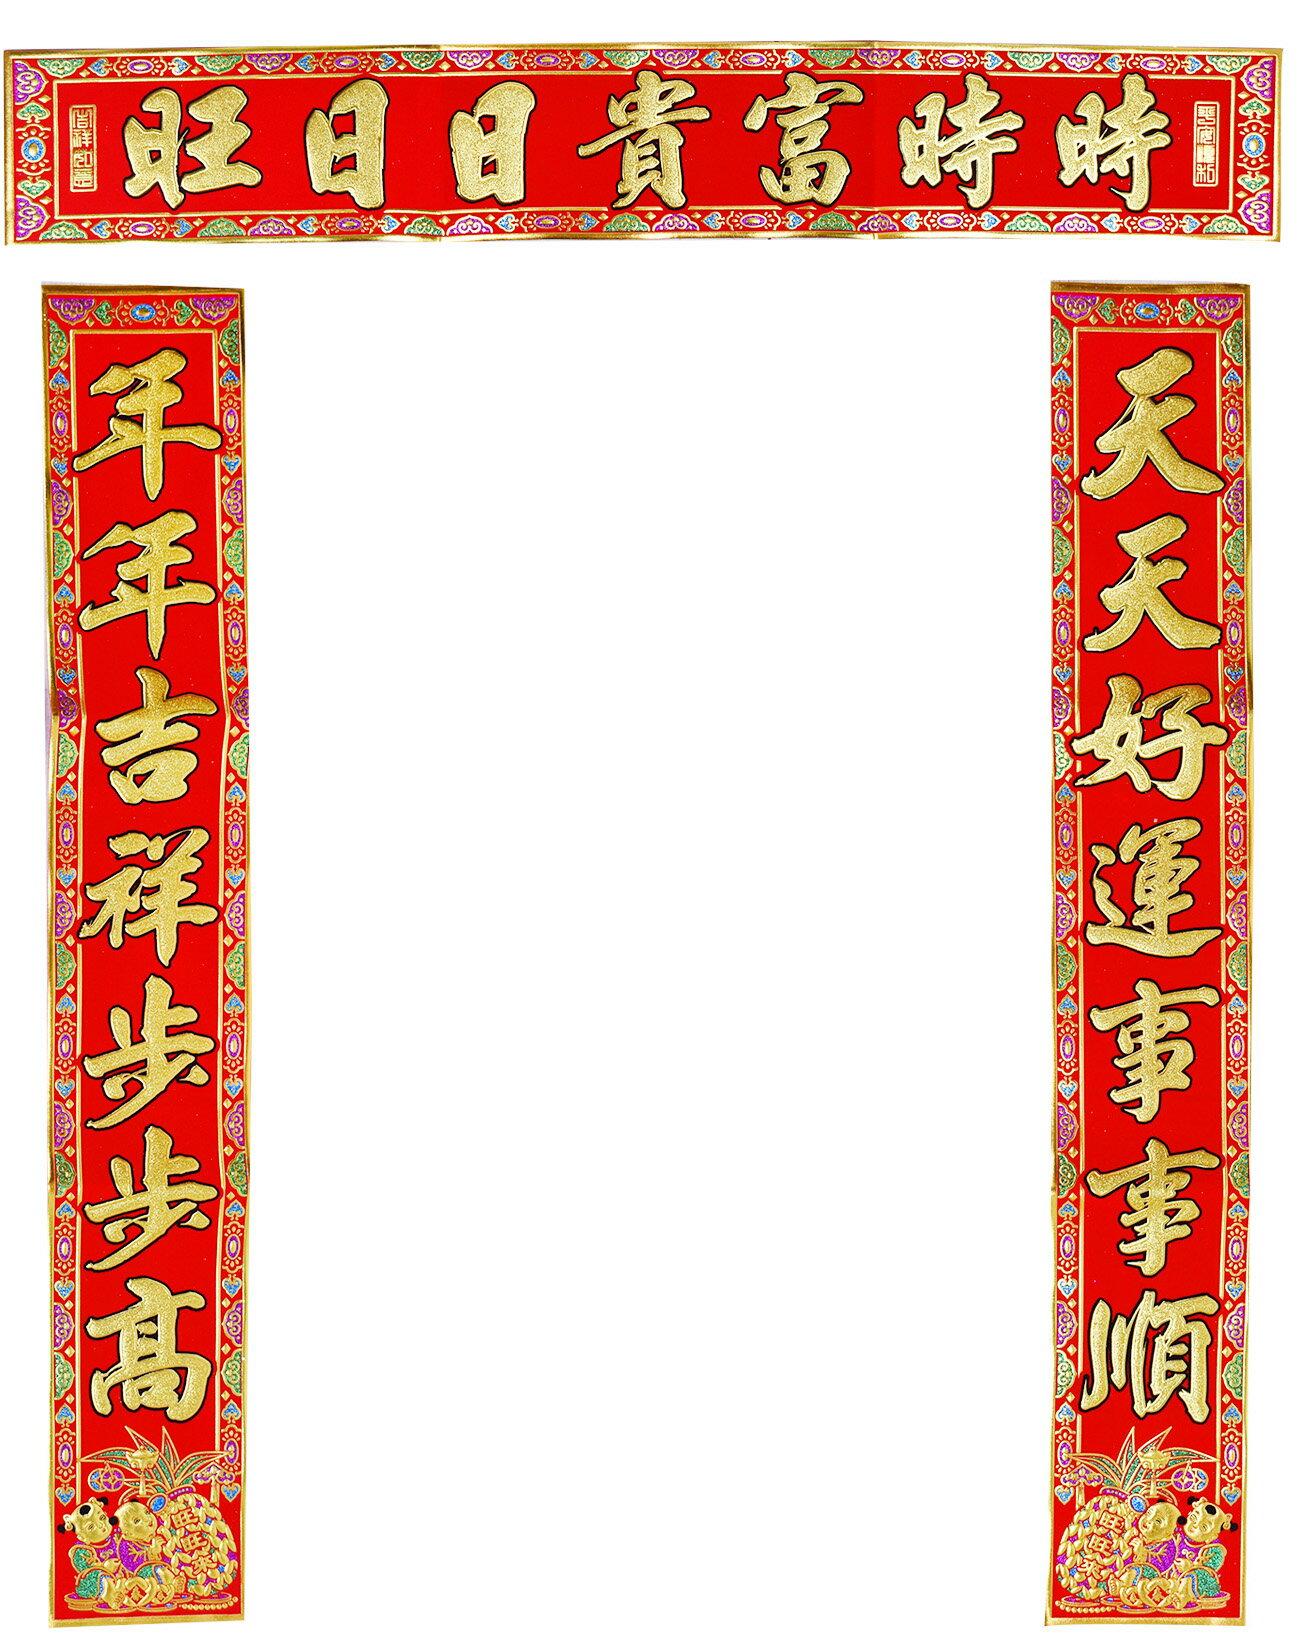 X射線【Z658112】5K絨布彩金門聯,春聯/字貼/佈置/過年/雞年/燙金/門貼/對聯/住家裝飾